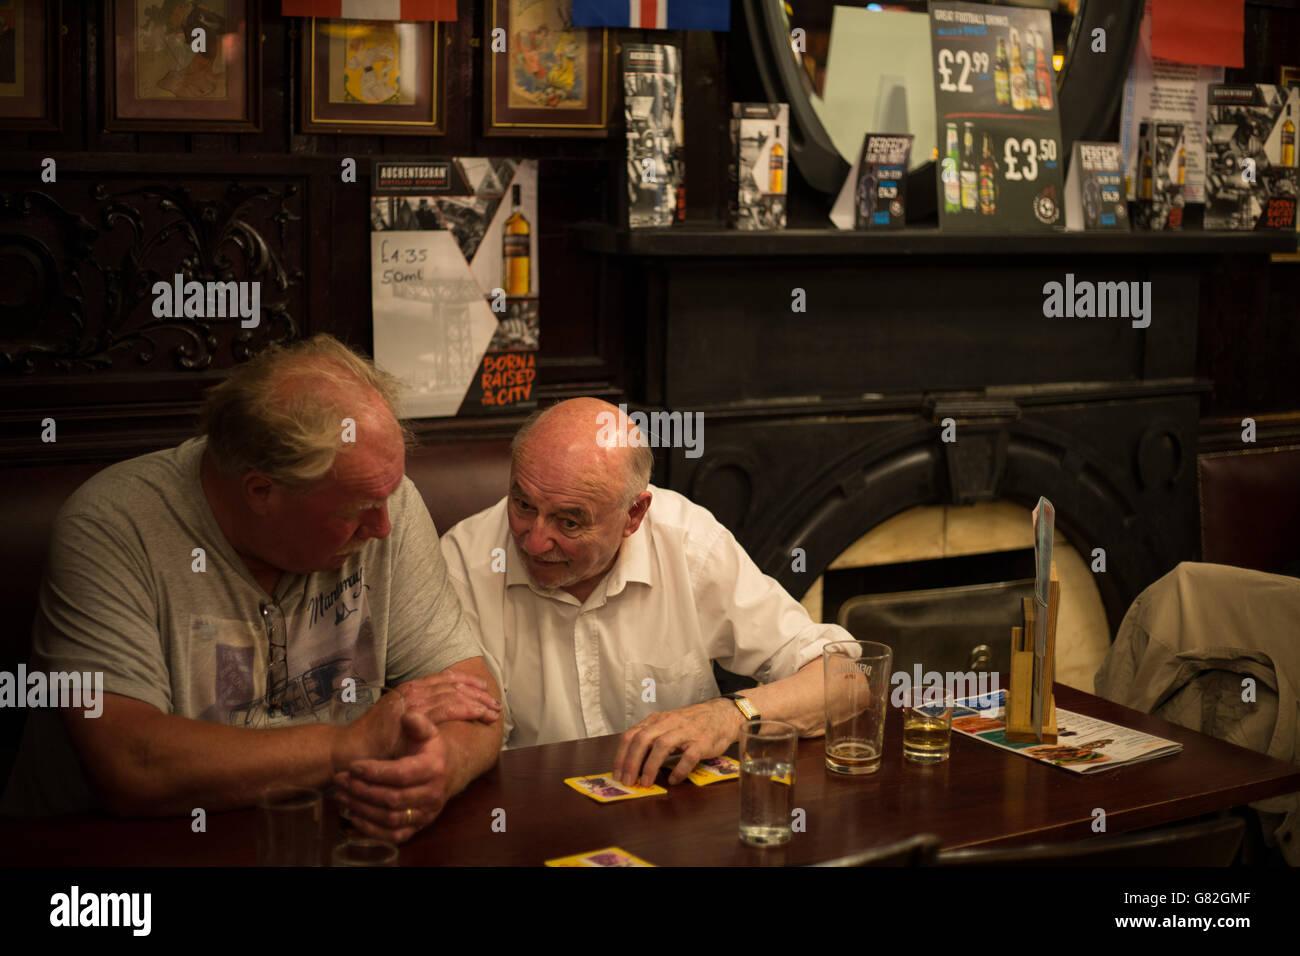 enjoying a drink in The Horse Shoe bar, Glasgow, Scotland, UK. Stock Photo